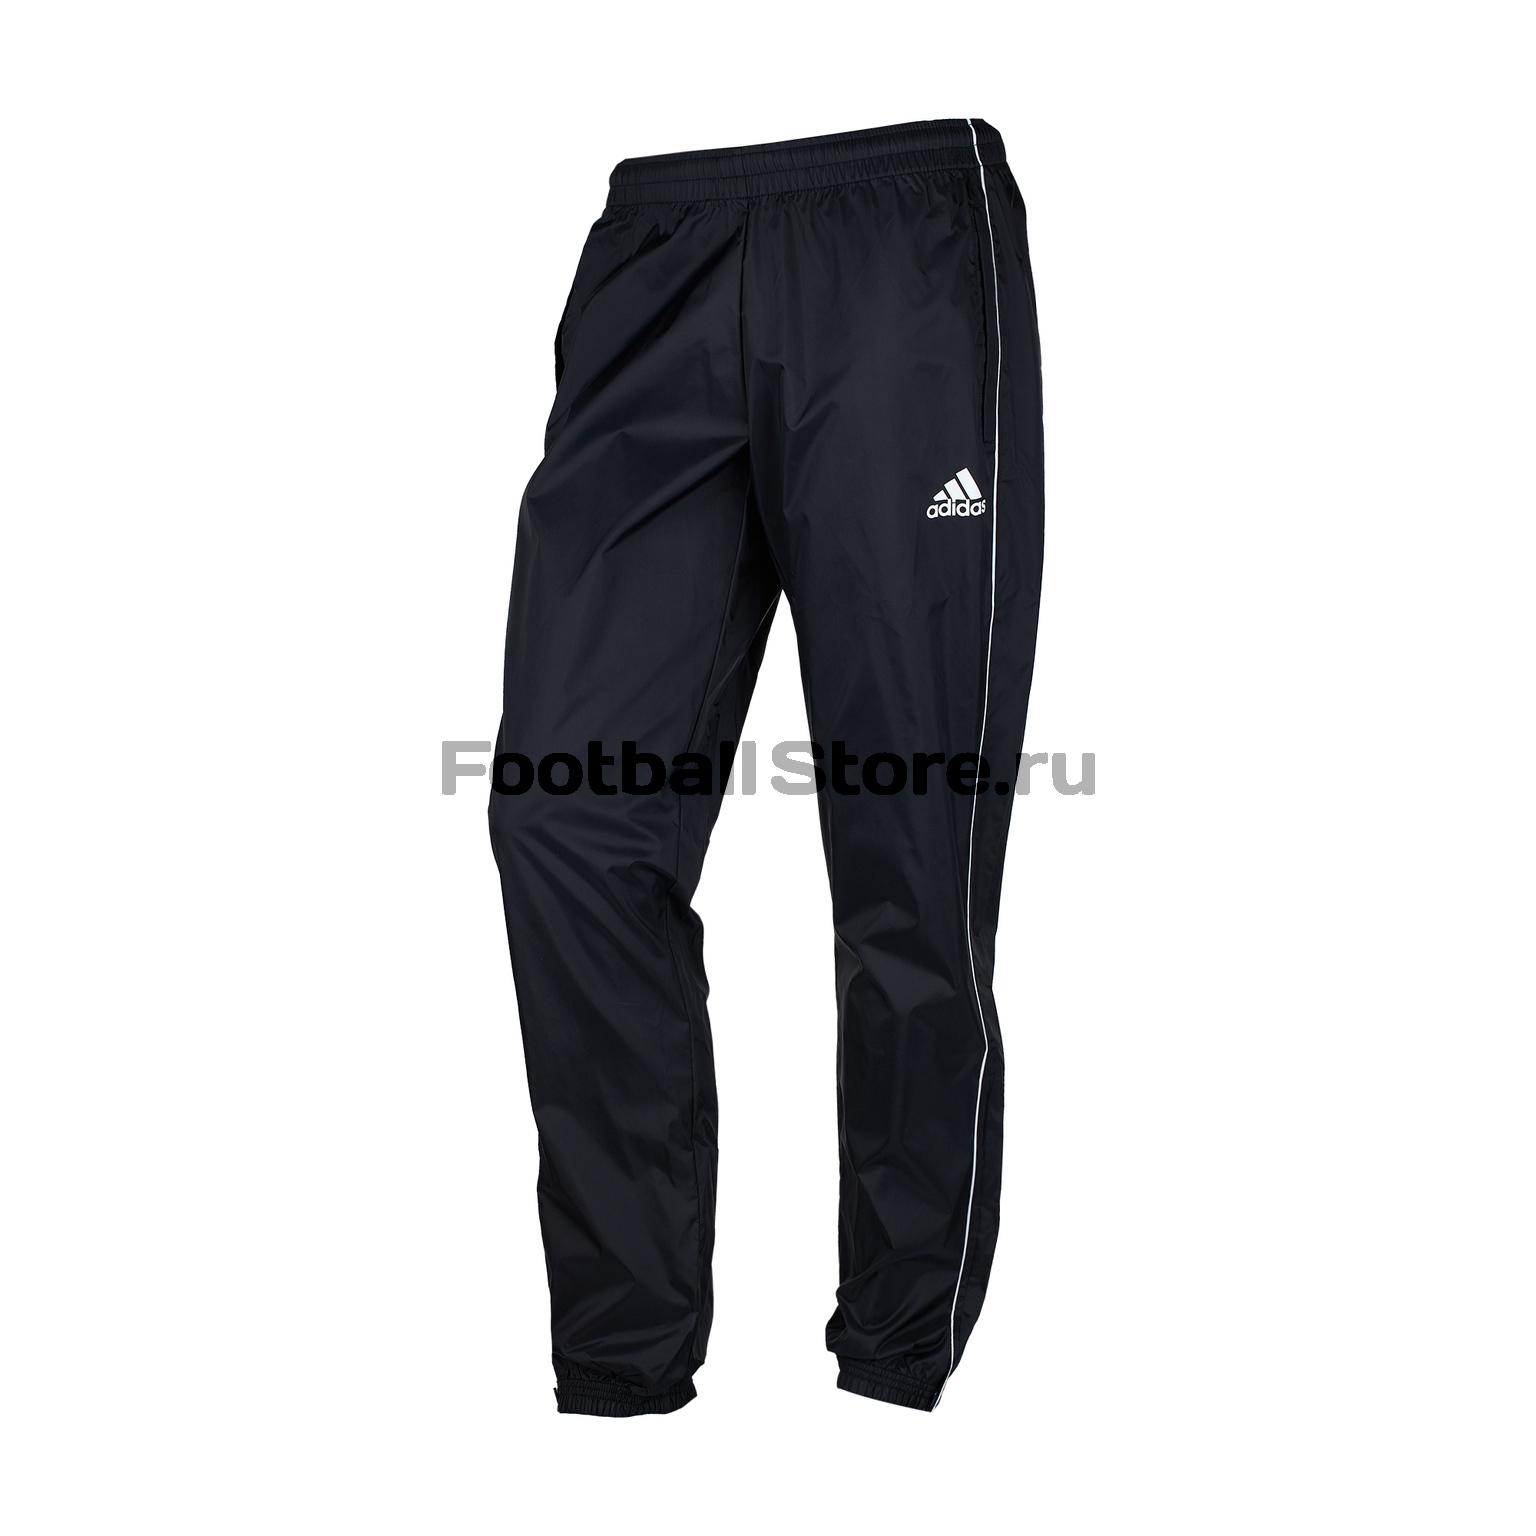 Брюки Adidas Core18 Rain Pnt CE9060 брюки adidas con16 trg pnt ab3131